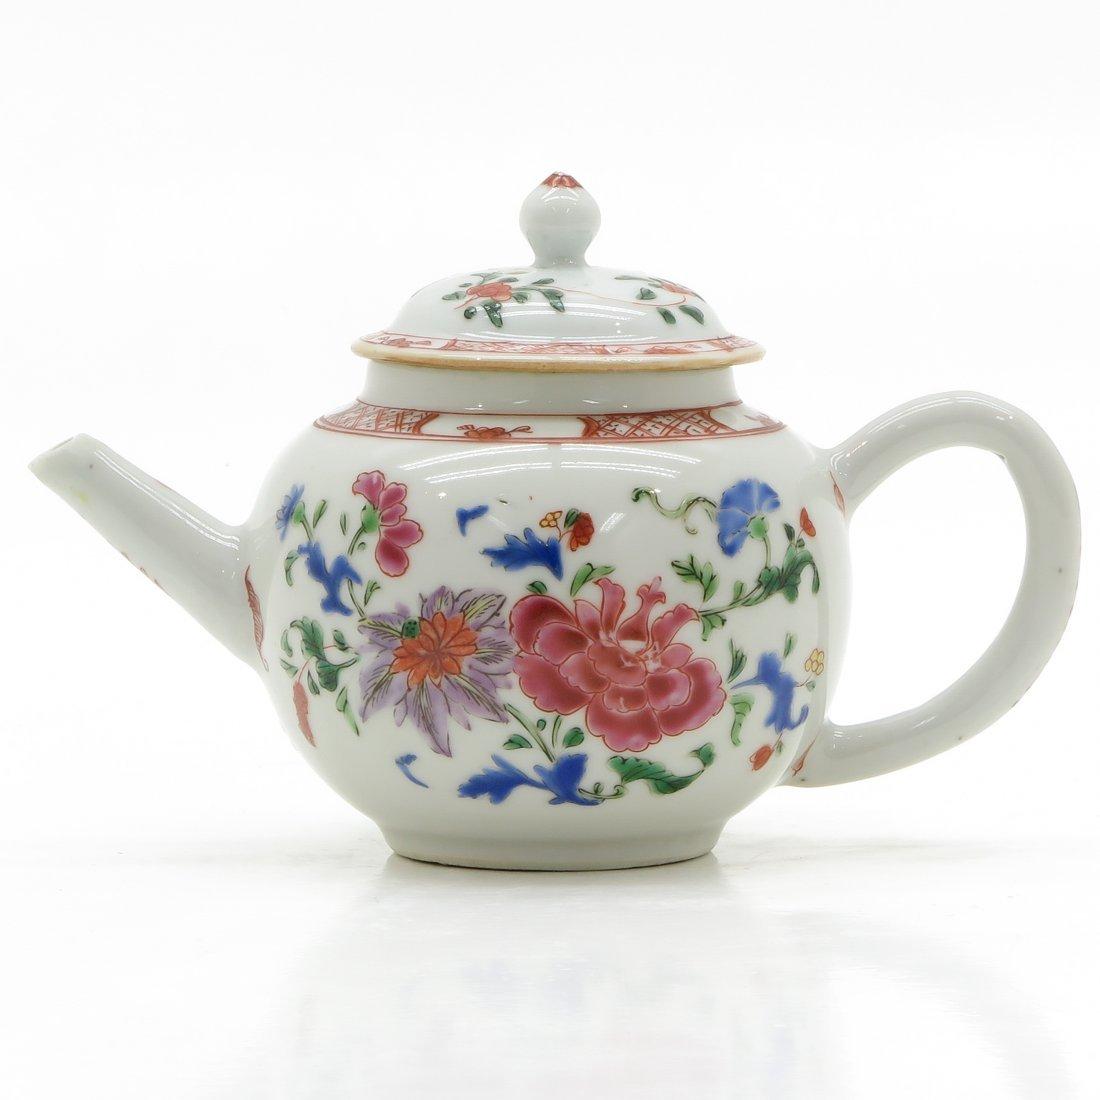 18th / 19th Century China Porcelain Teapot